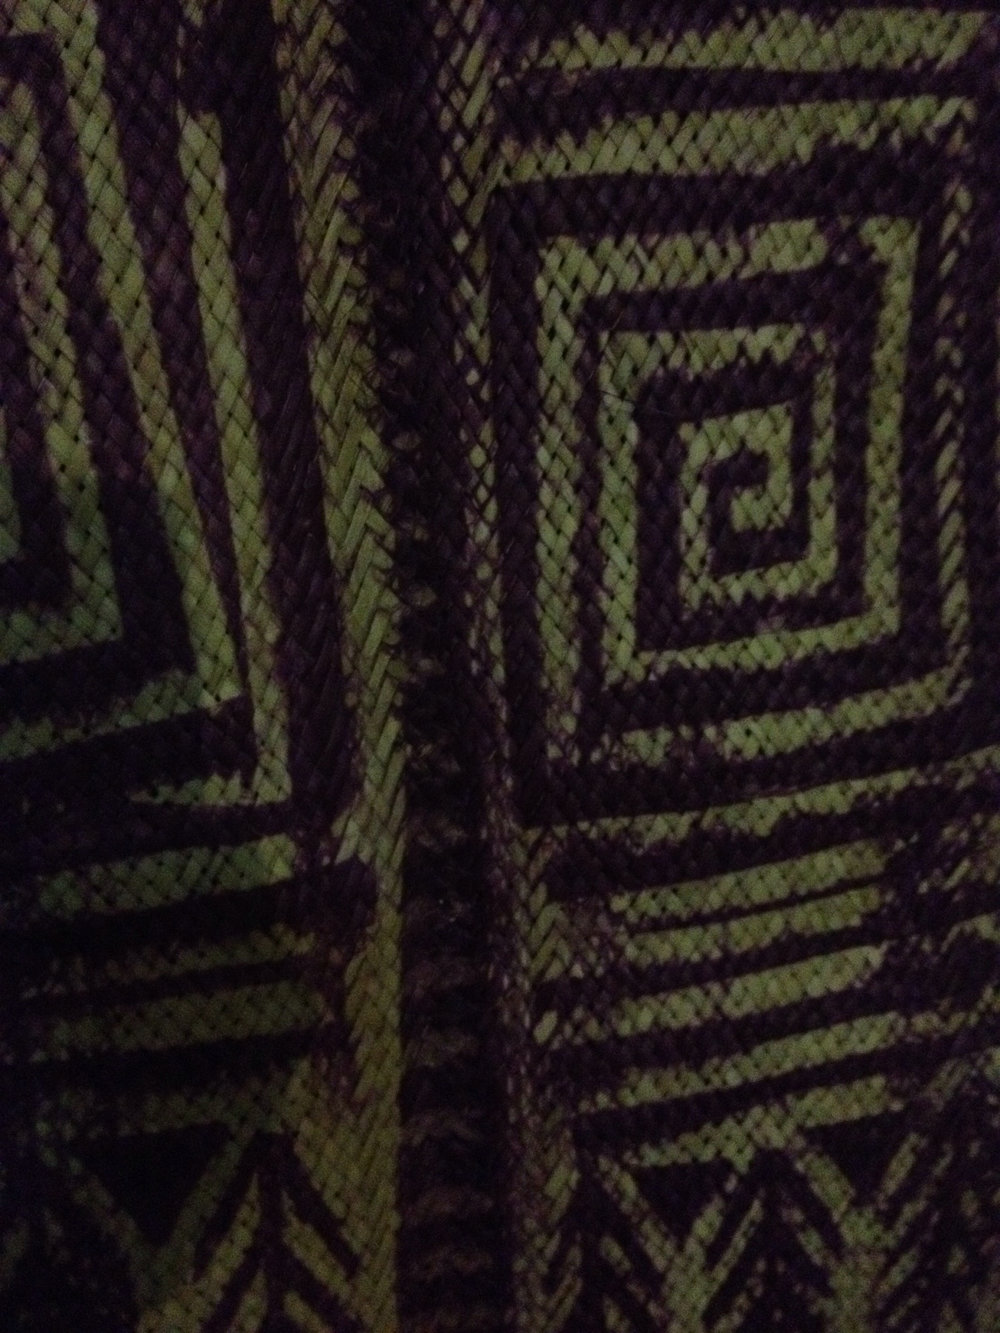 162/365 Patterns